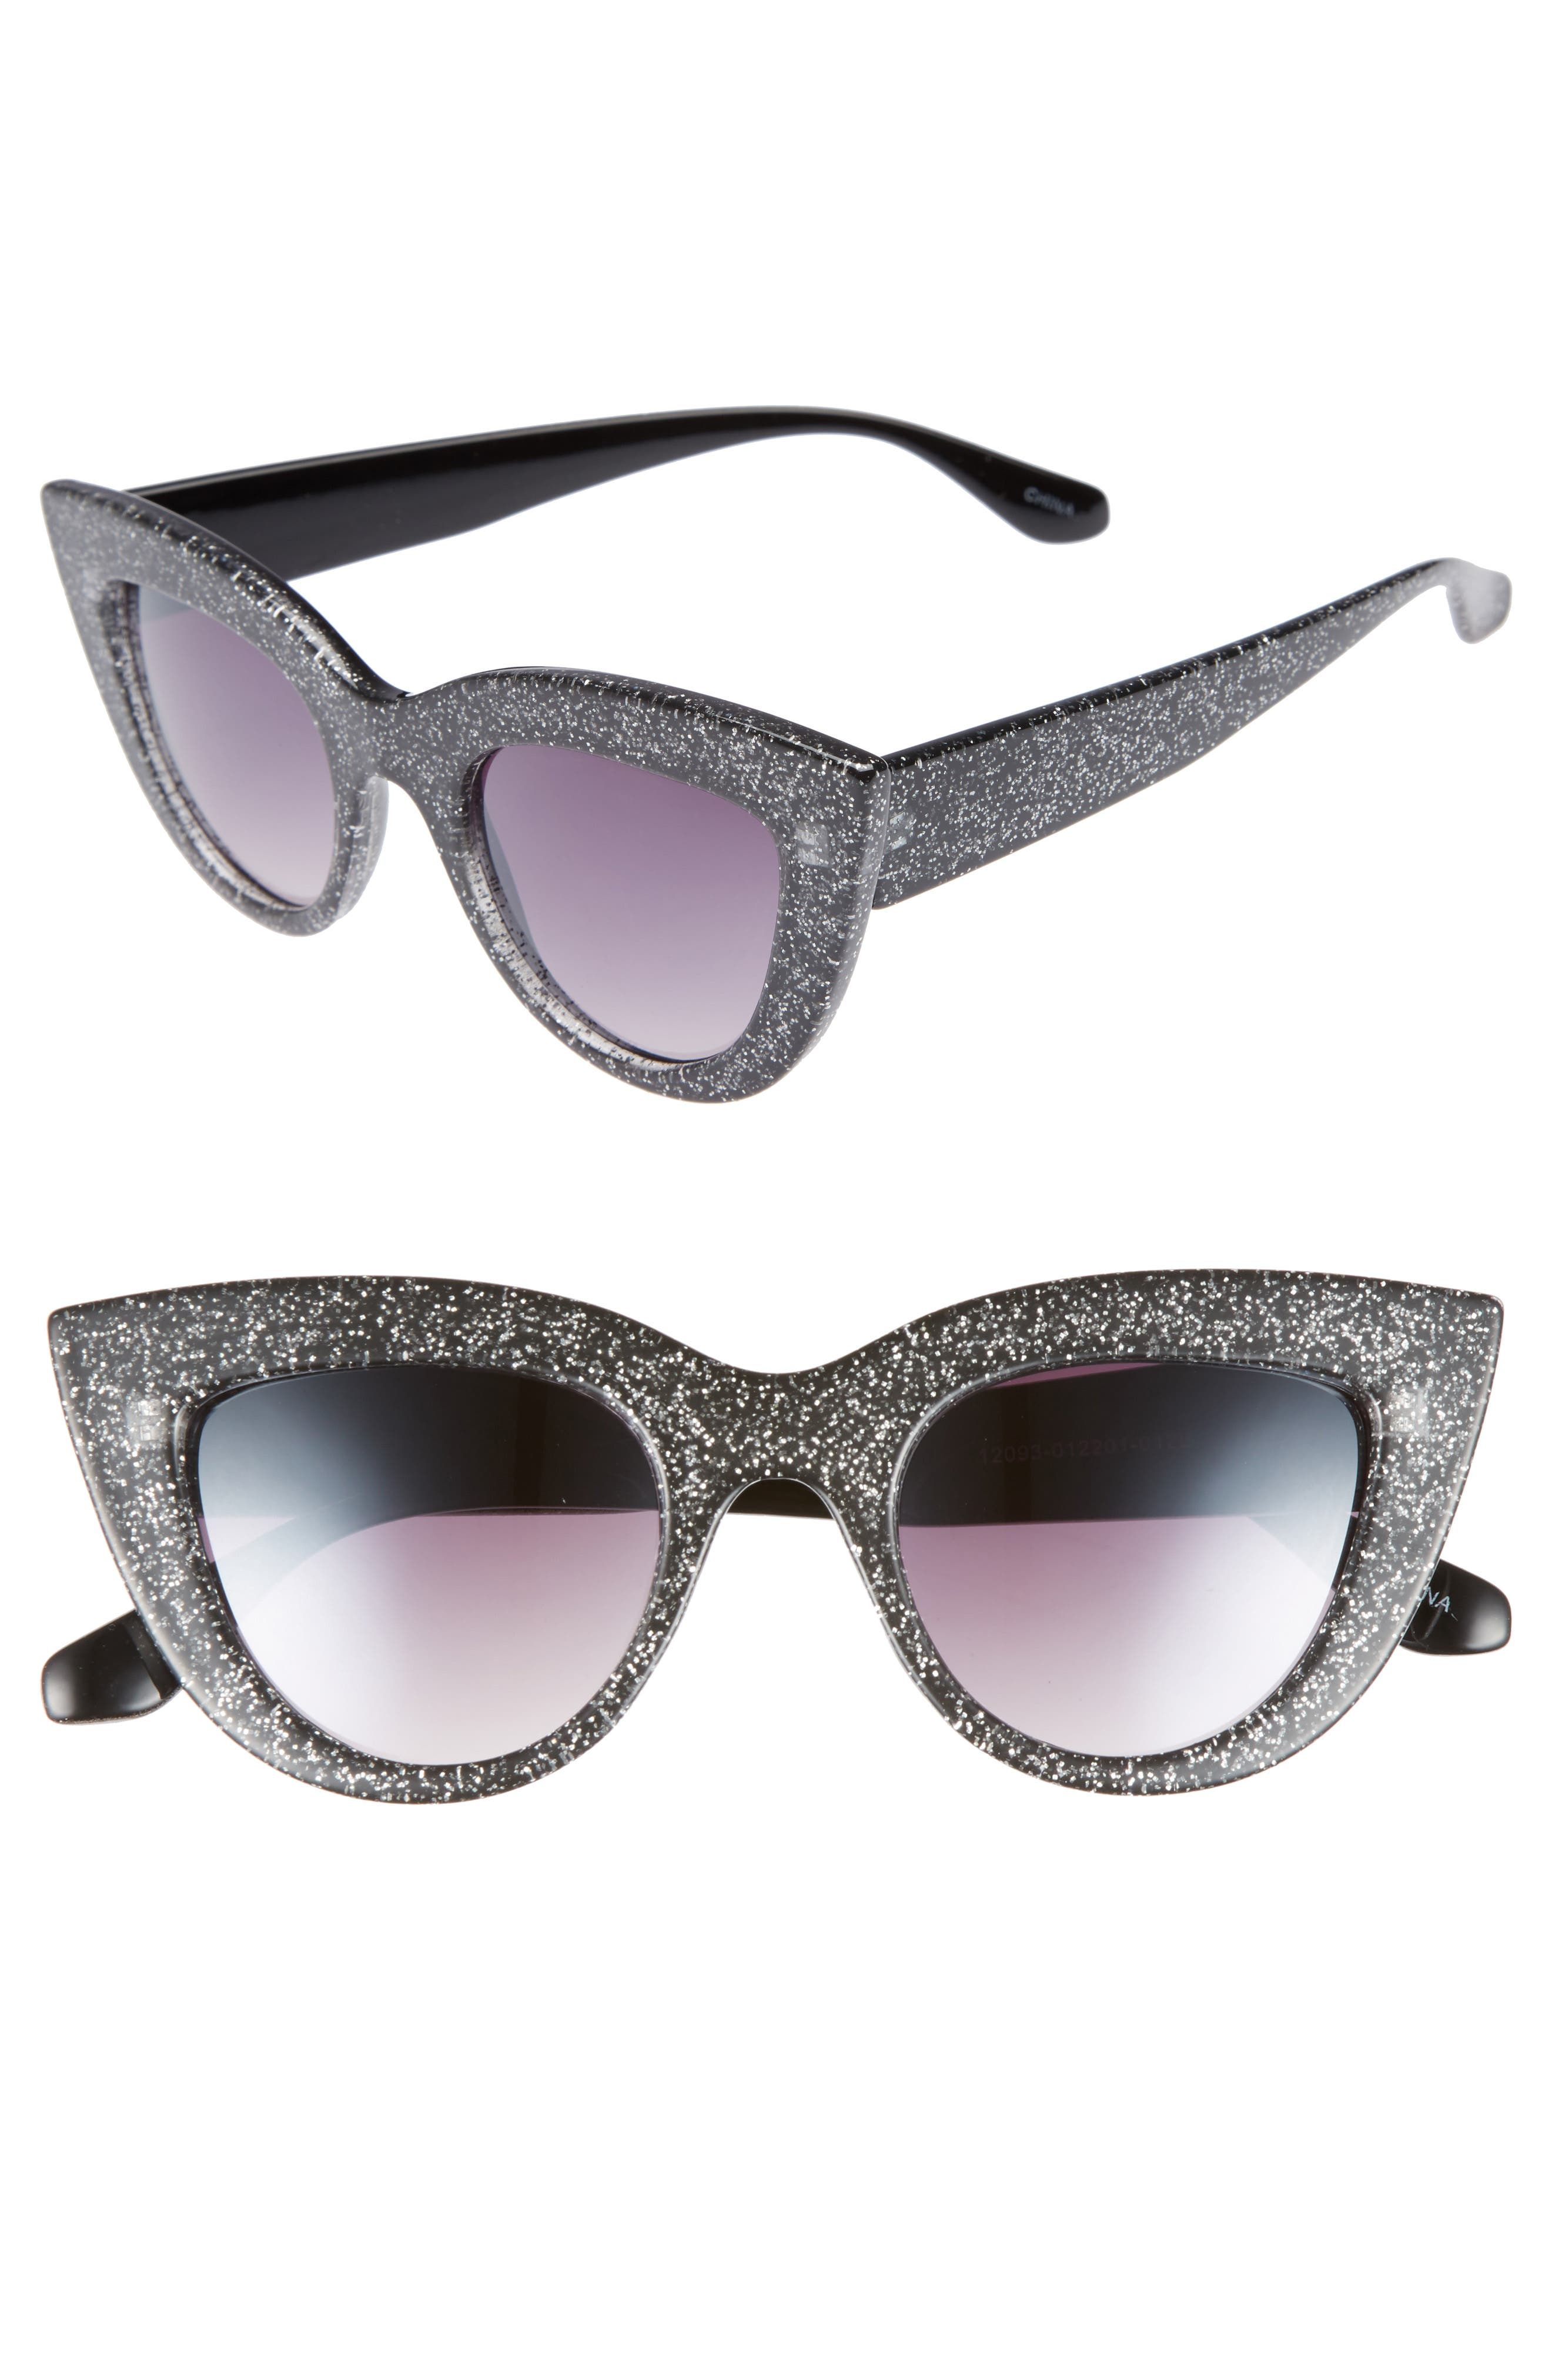 45mm Glitter Cat Eye Sunglasses,                         Main,                         color, 001